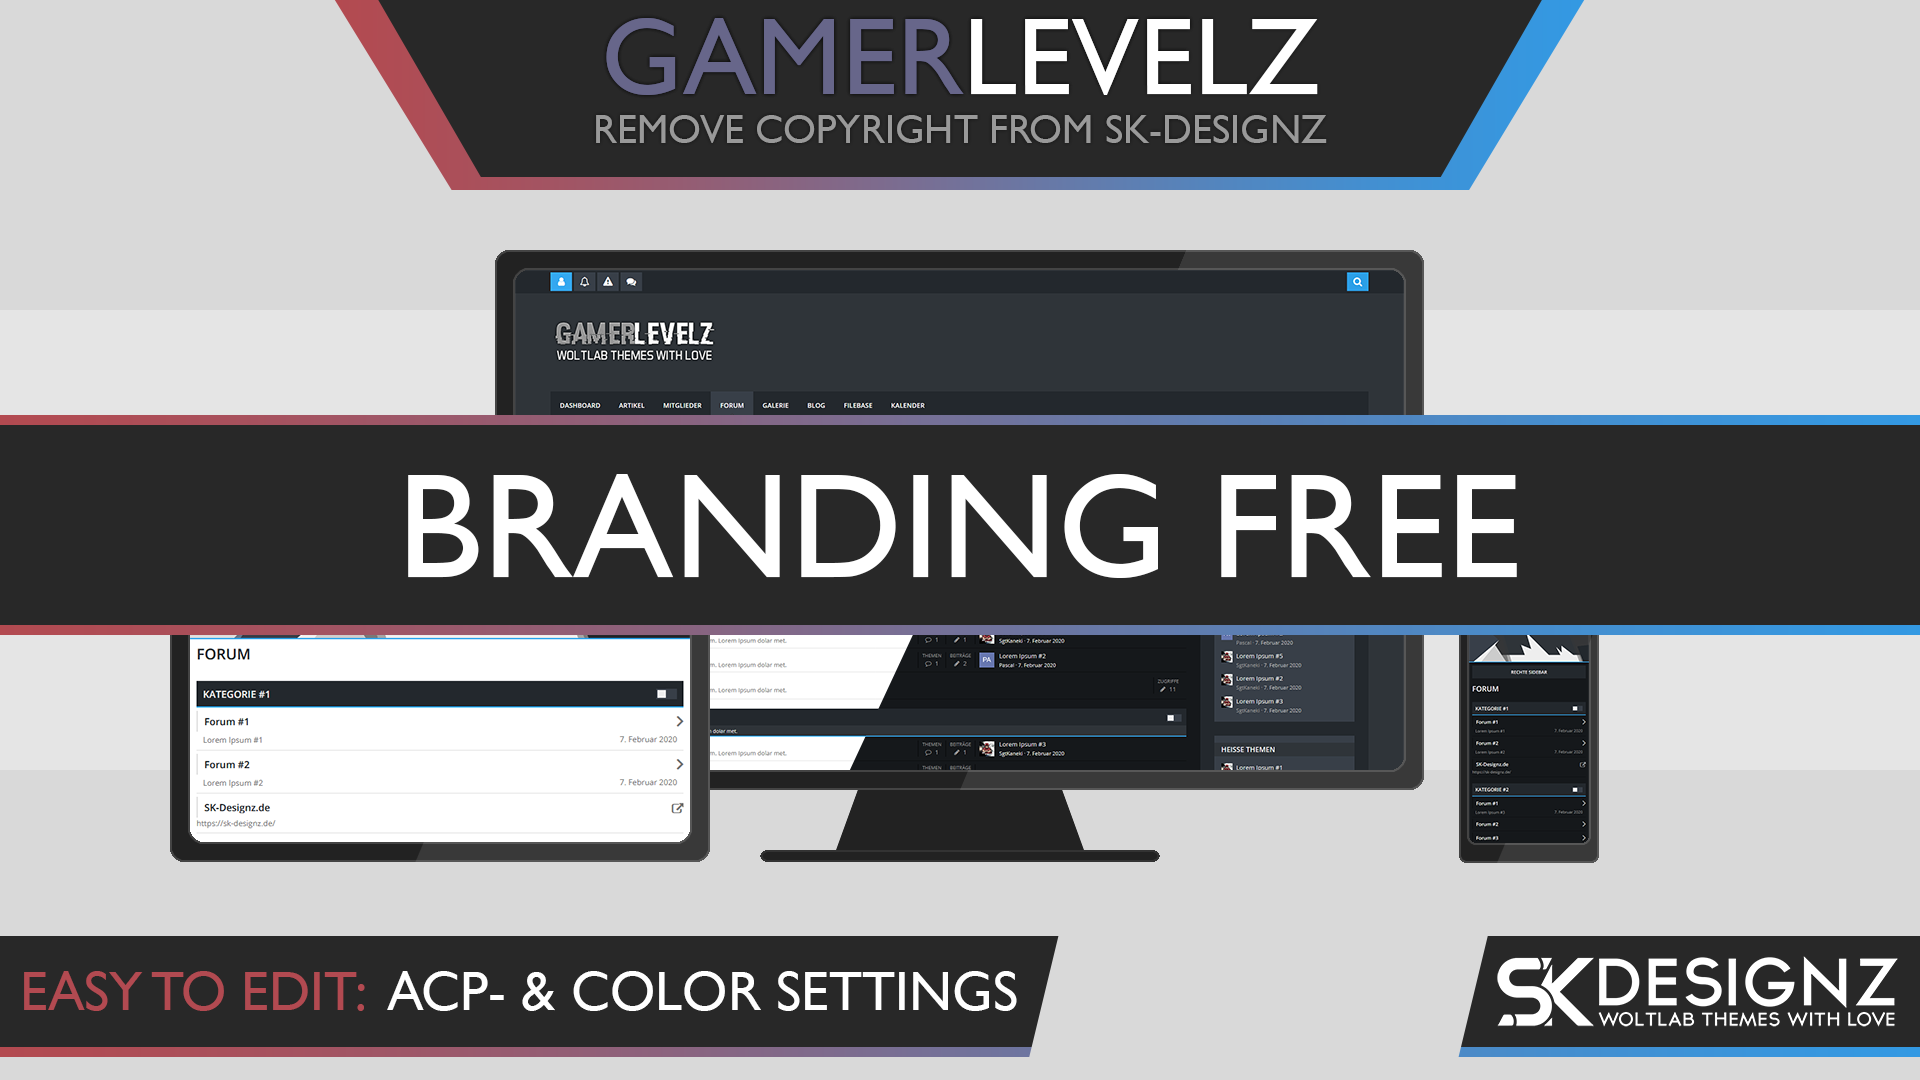 GamerLevelz - Branding Free